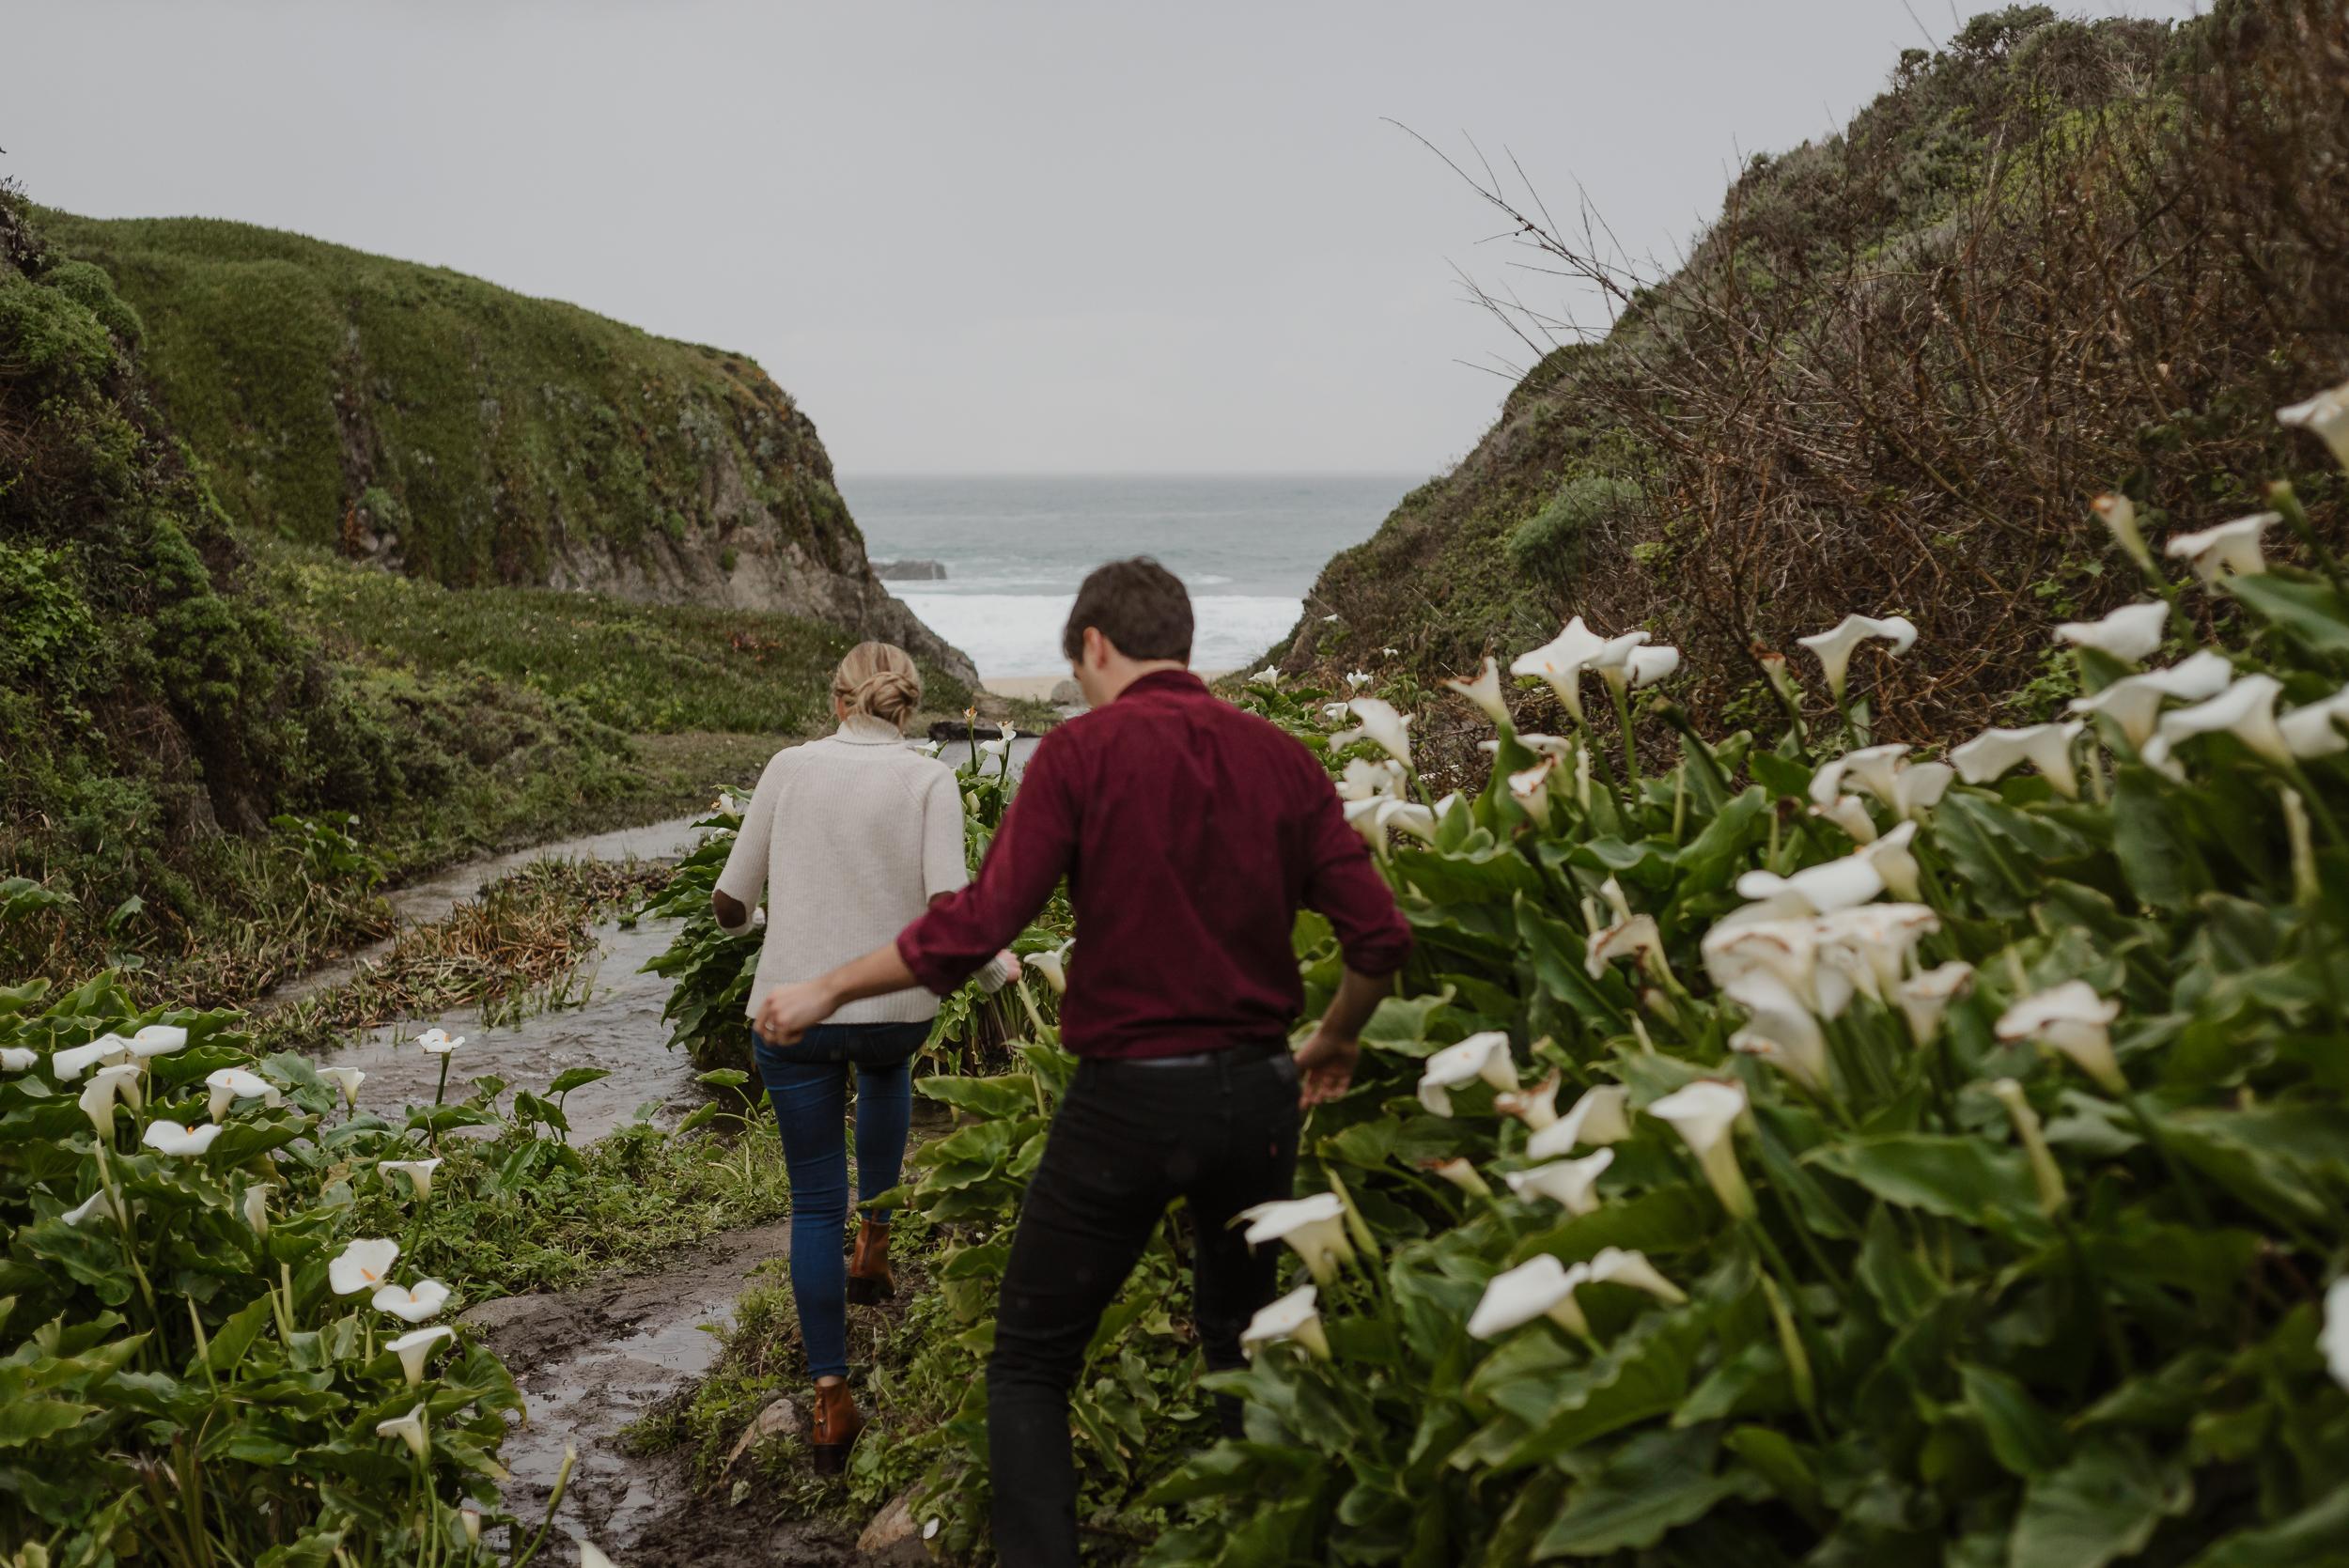 carmel-big-sur-garrapata-state-park-california-coast-engagement-session-vivianchen-126.jpg